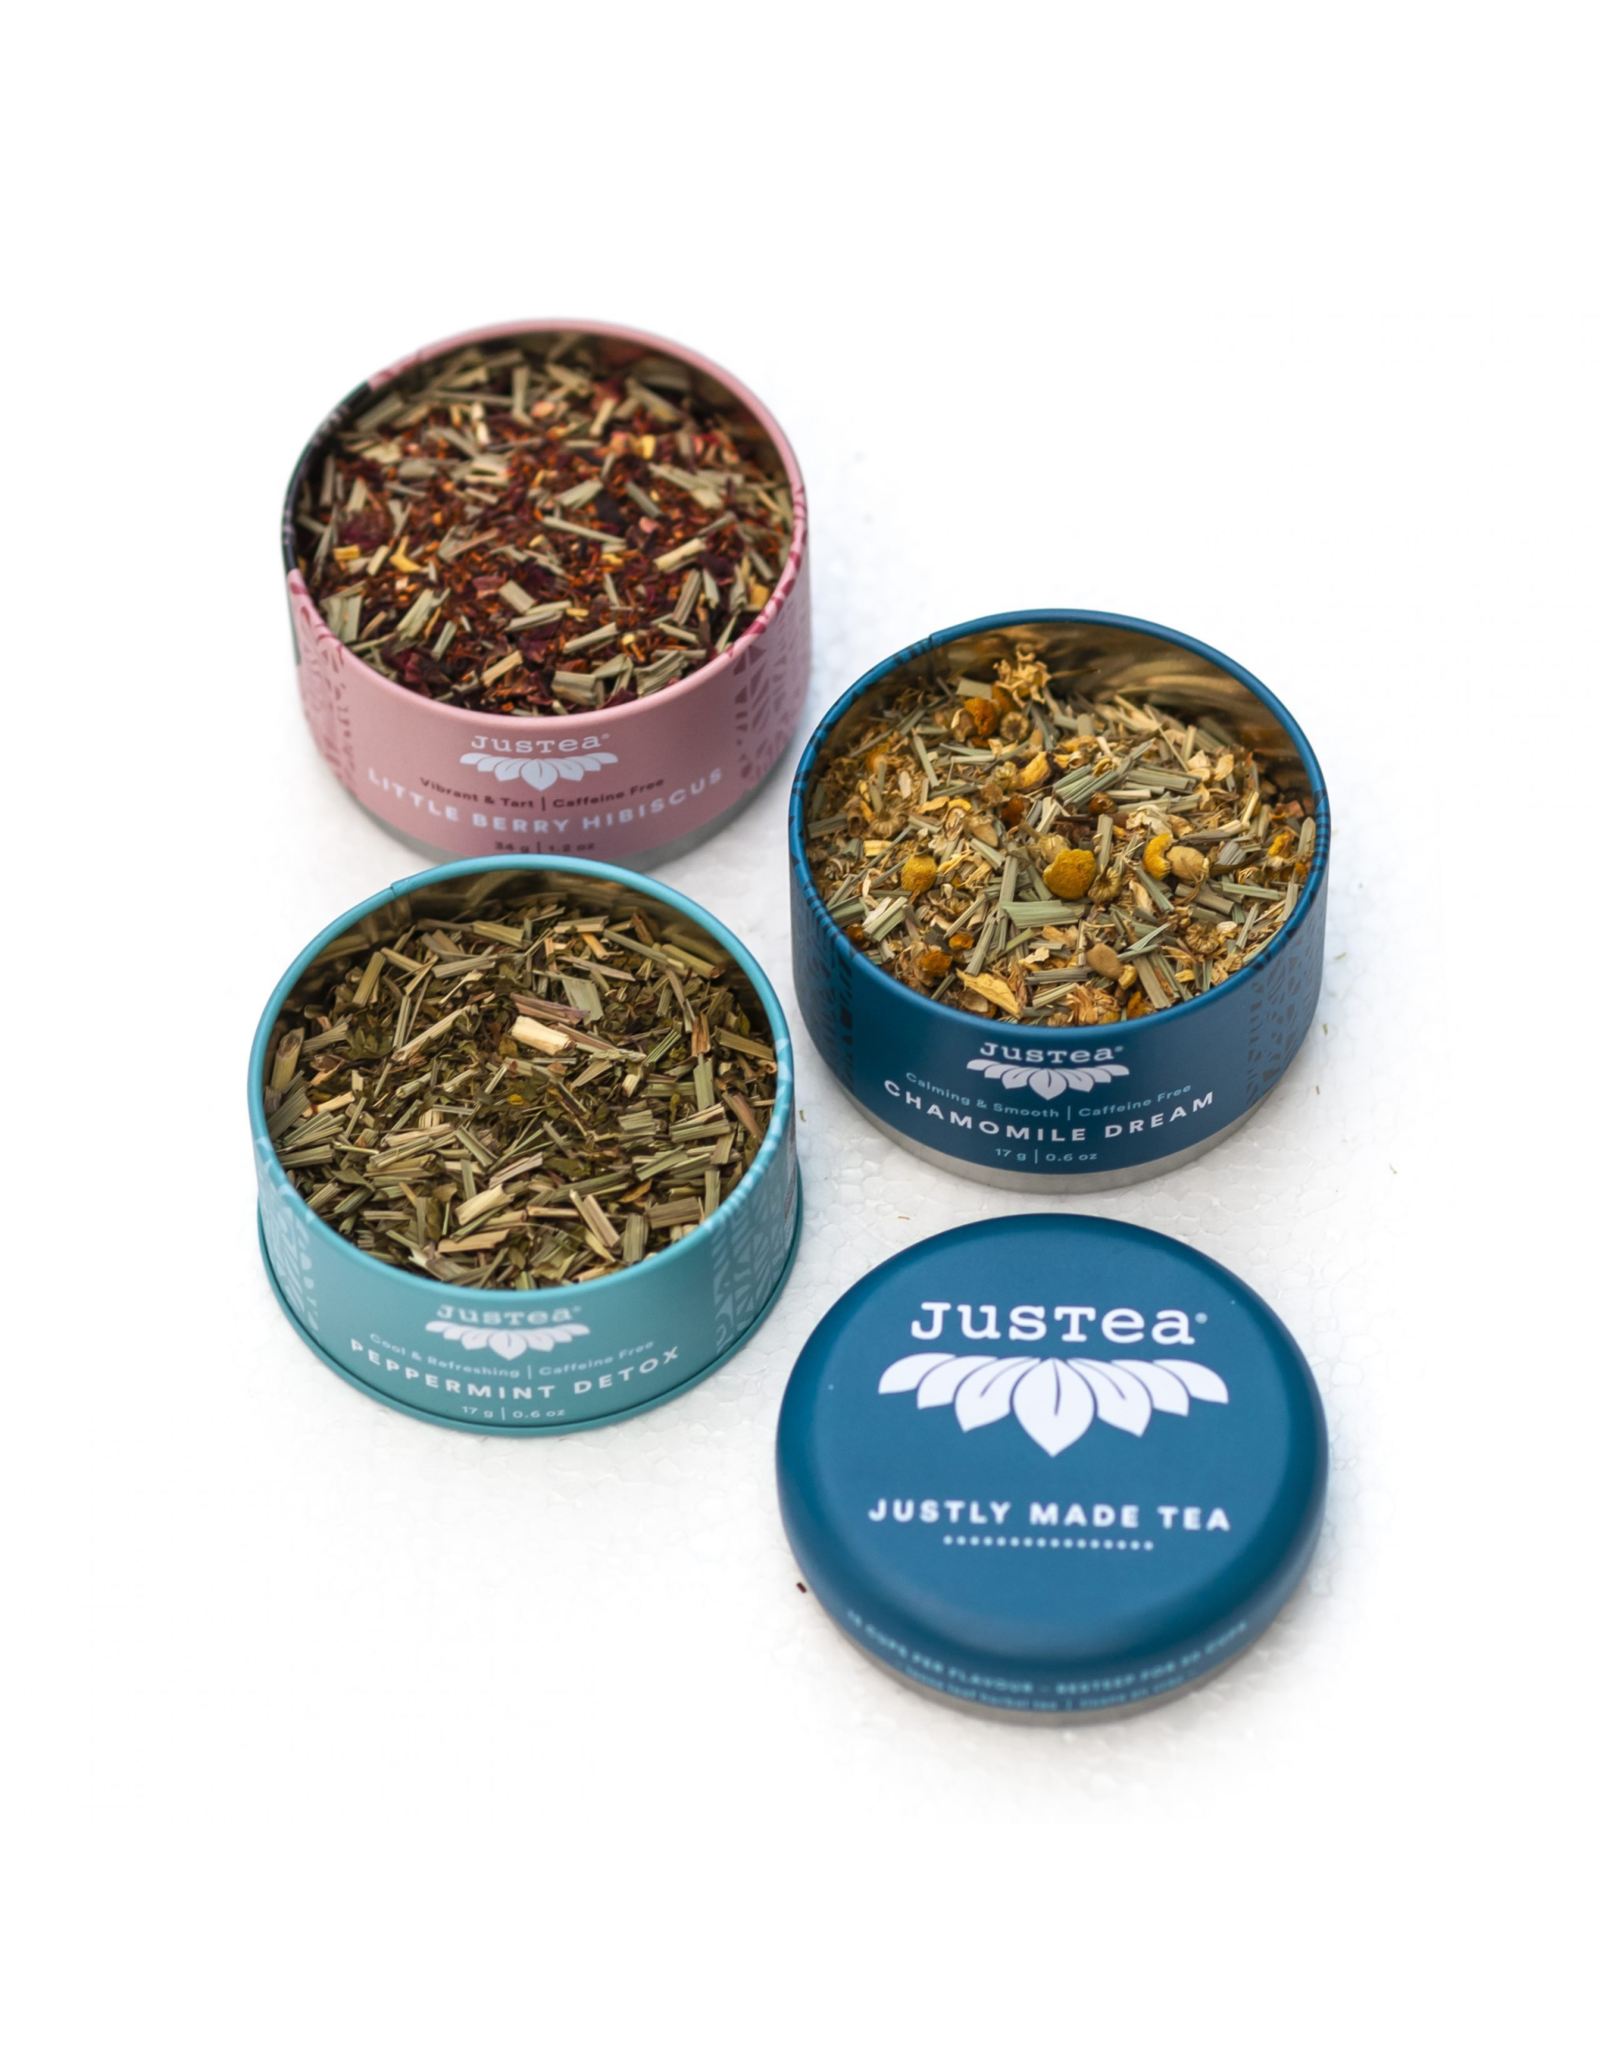 JusTea Herbal Tea Trio